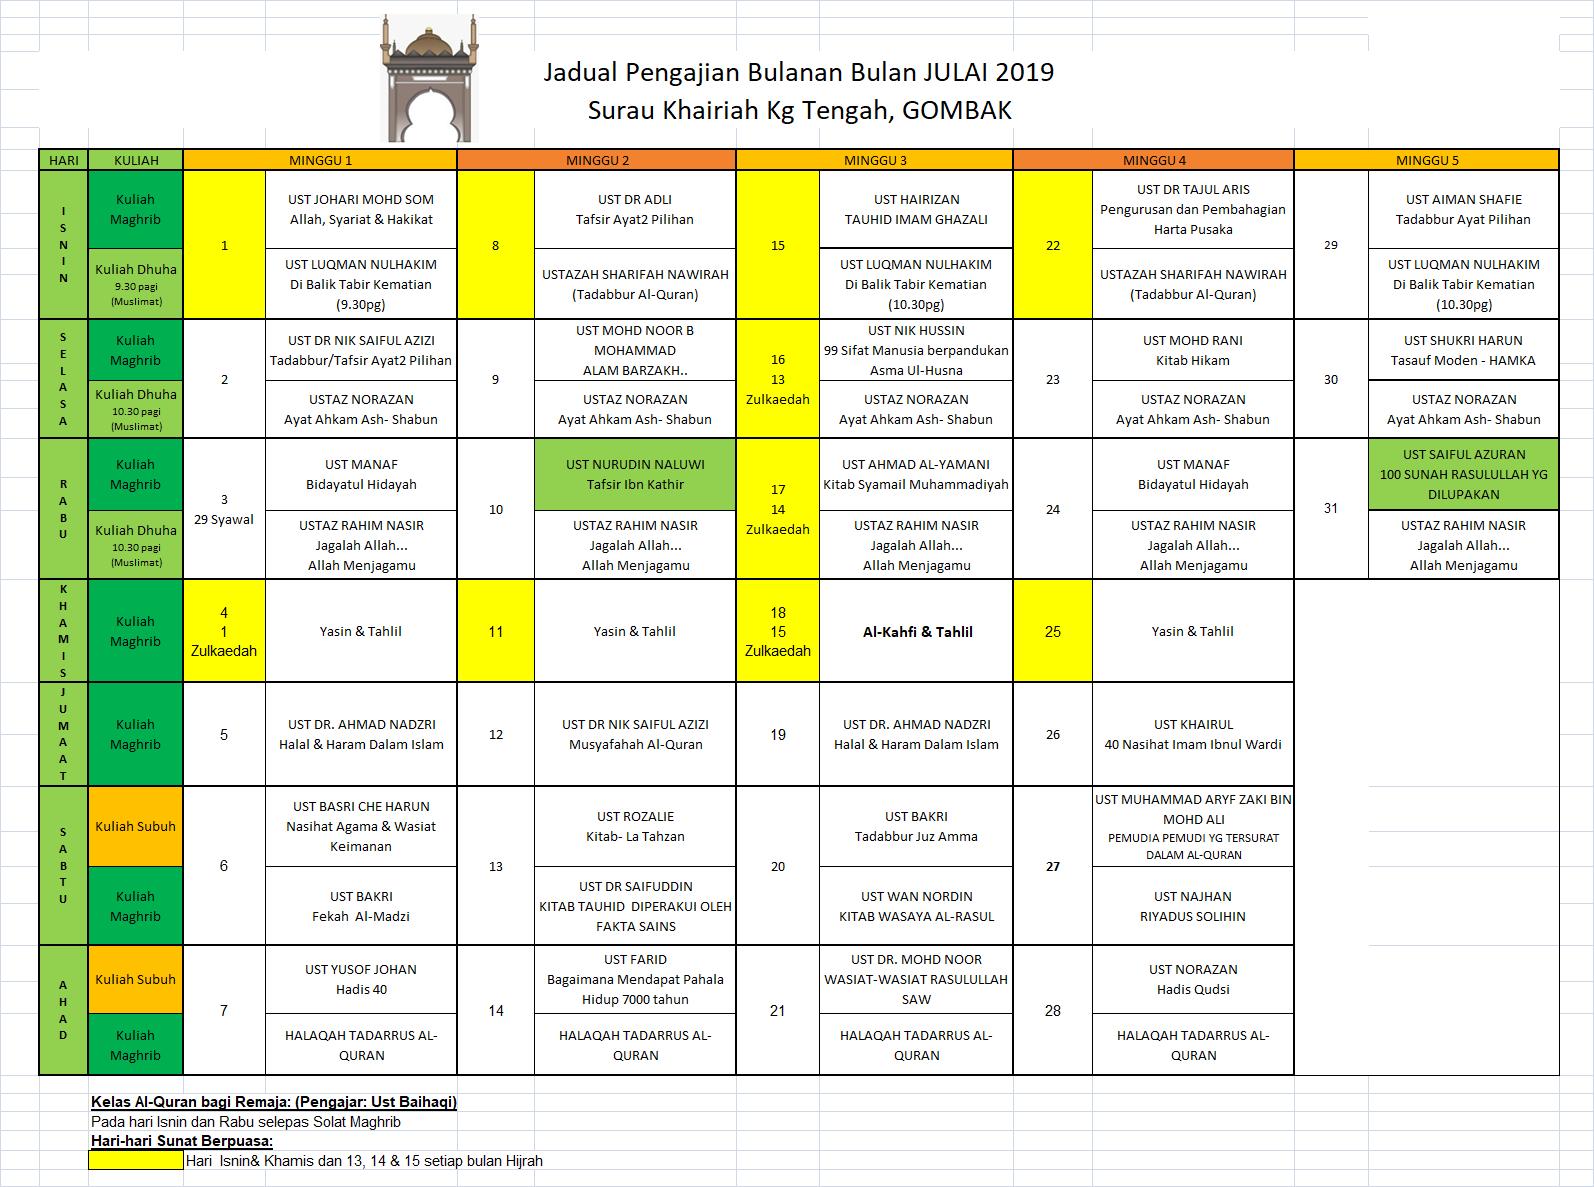 Jadual Julai 2019